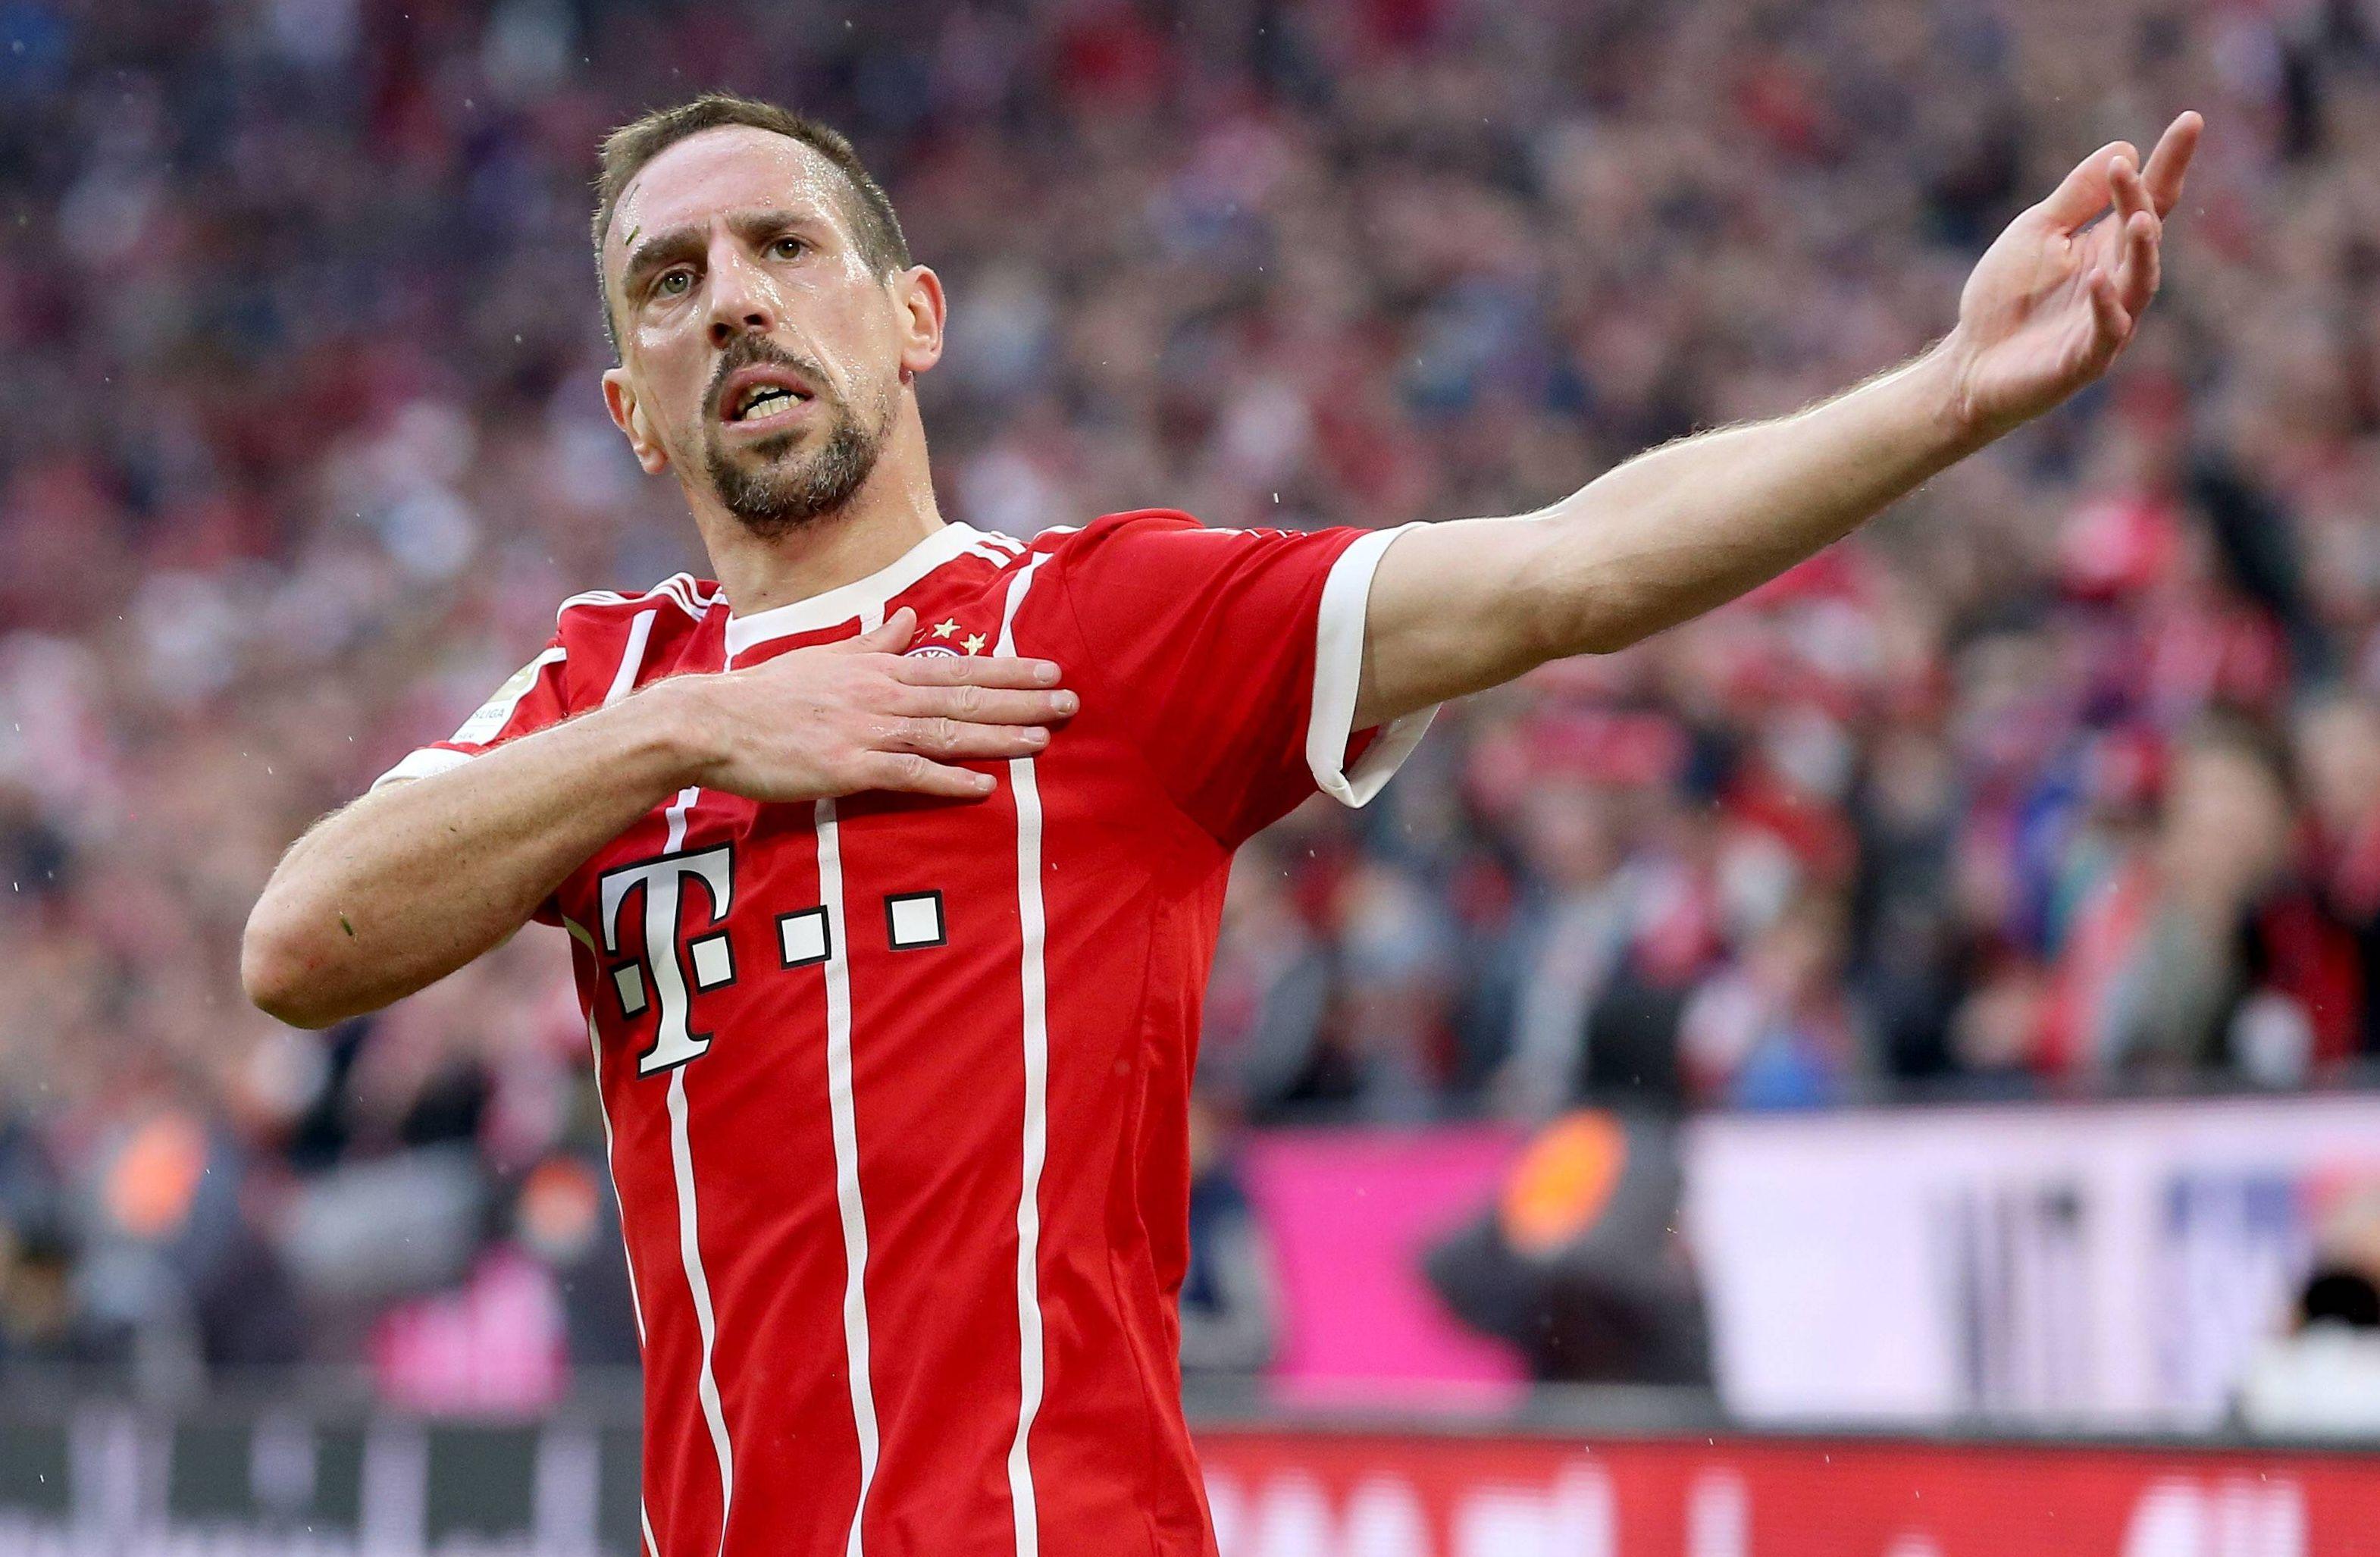 Football - Ligue des champions - Ribéry veut gagner sa place au Bayern... en 2019